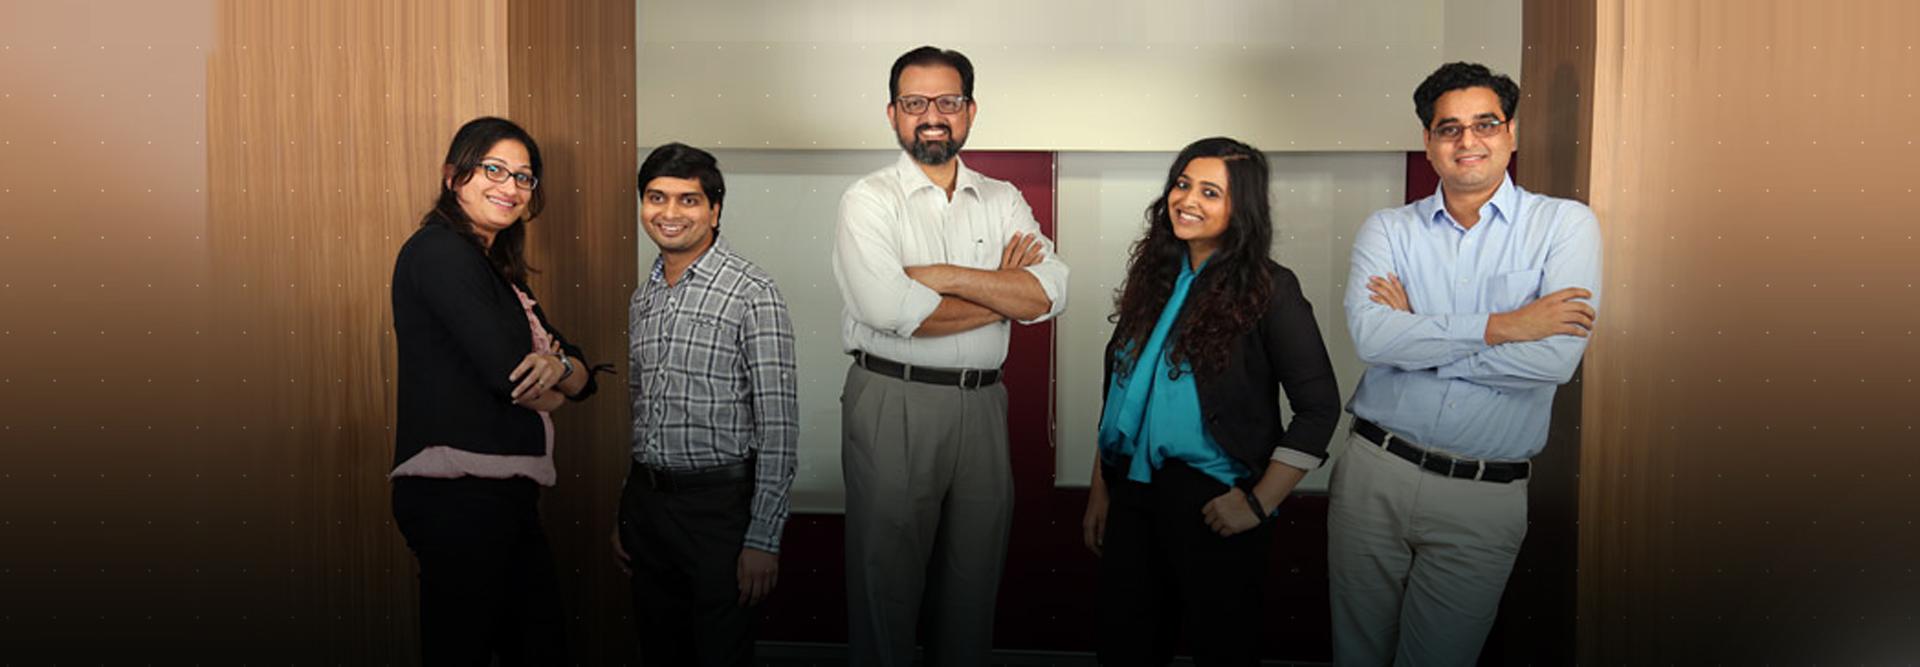 Career Opportunities - Tata Motors